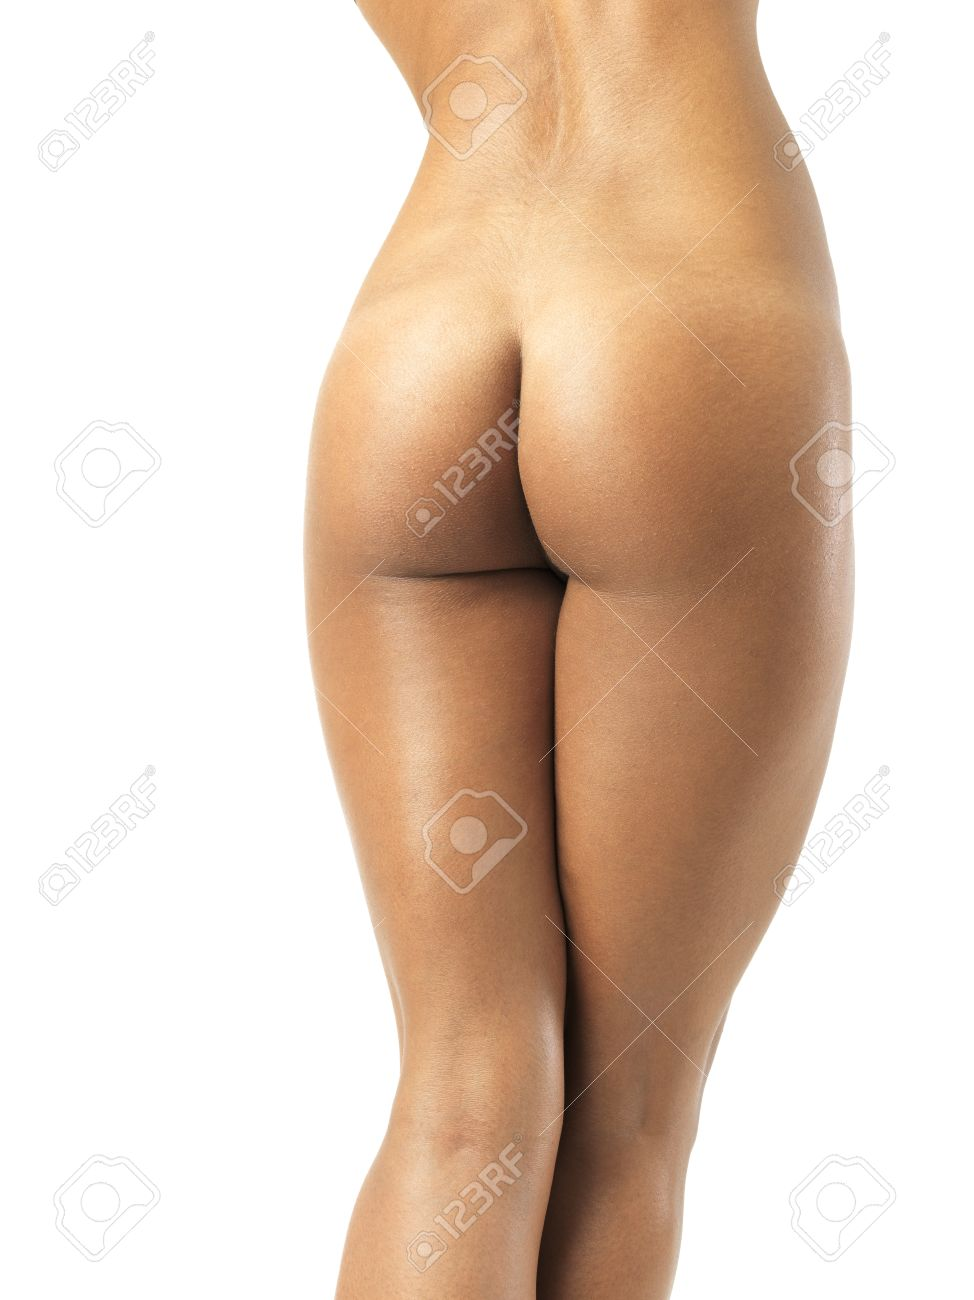 Pics of naked hermphrodites